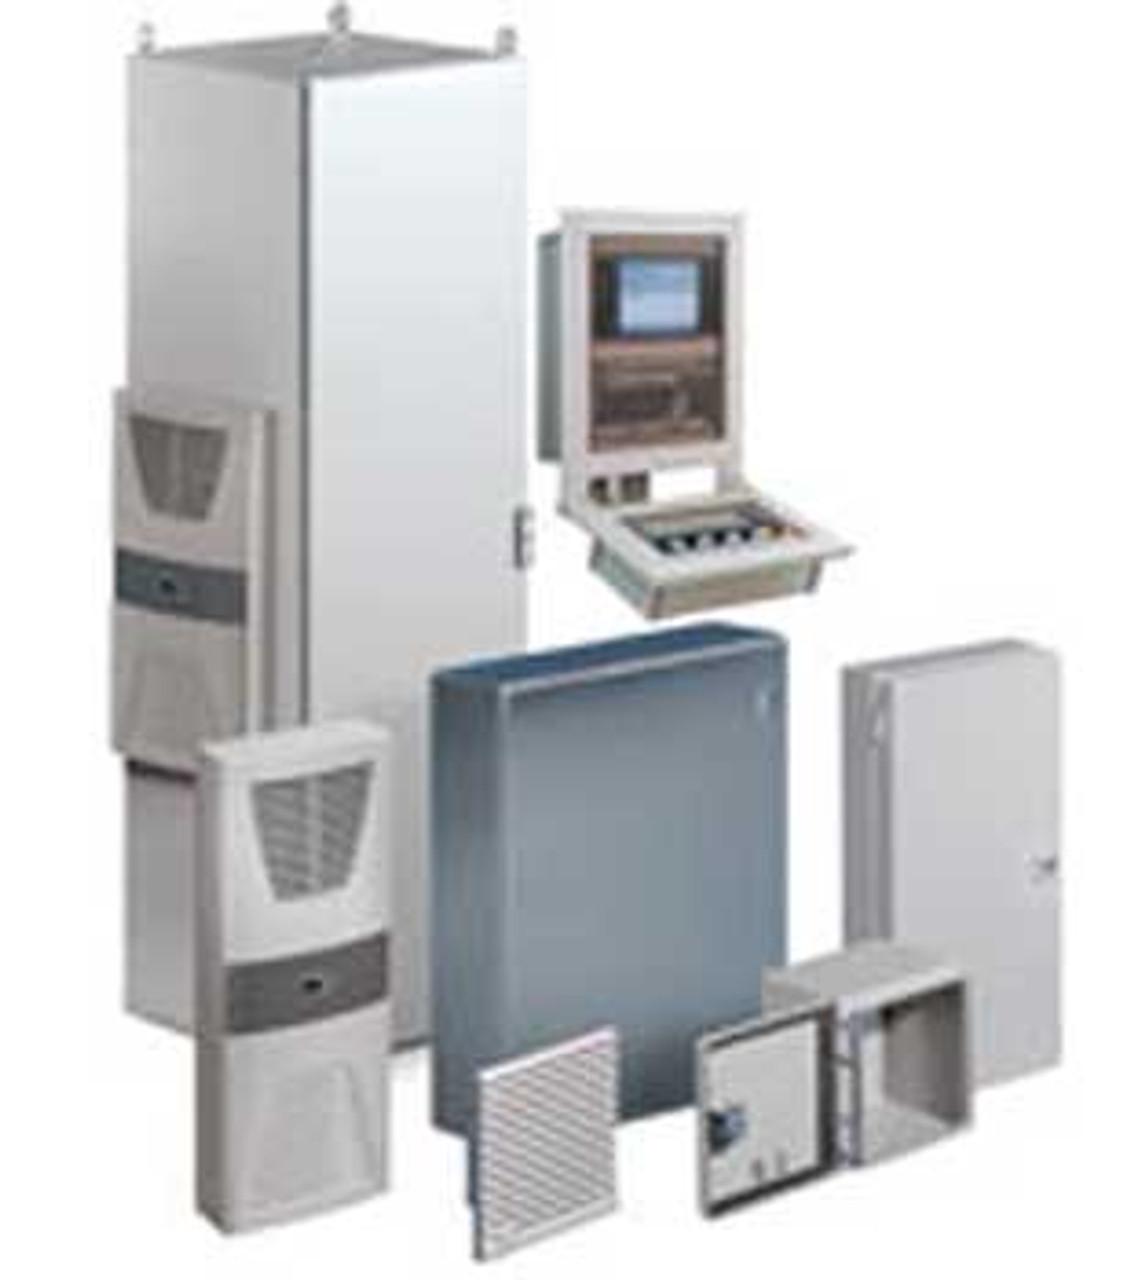 Rittal 1213600 AE 1000x1200x300 Carbon Steel Wallmount Enclosure - New